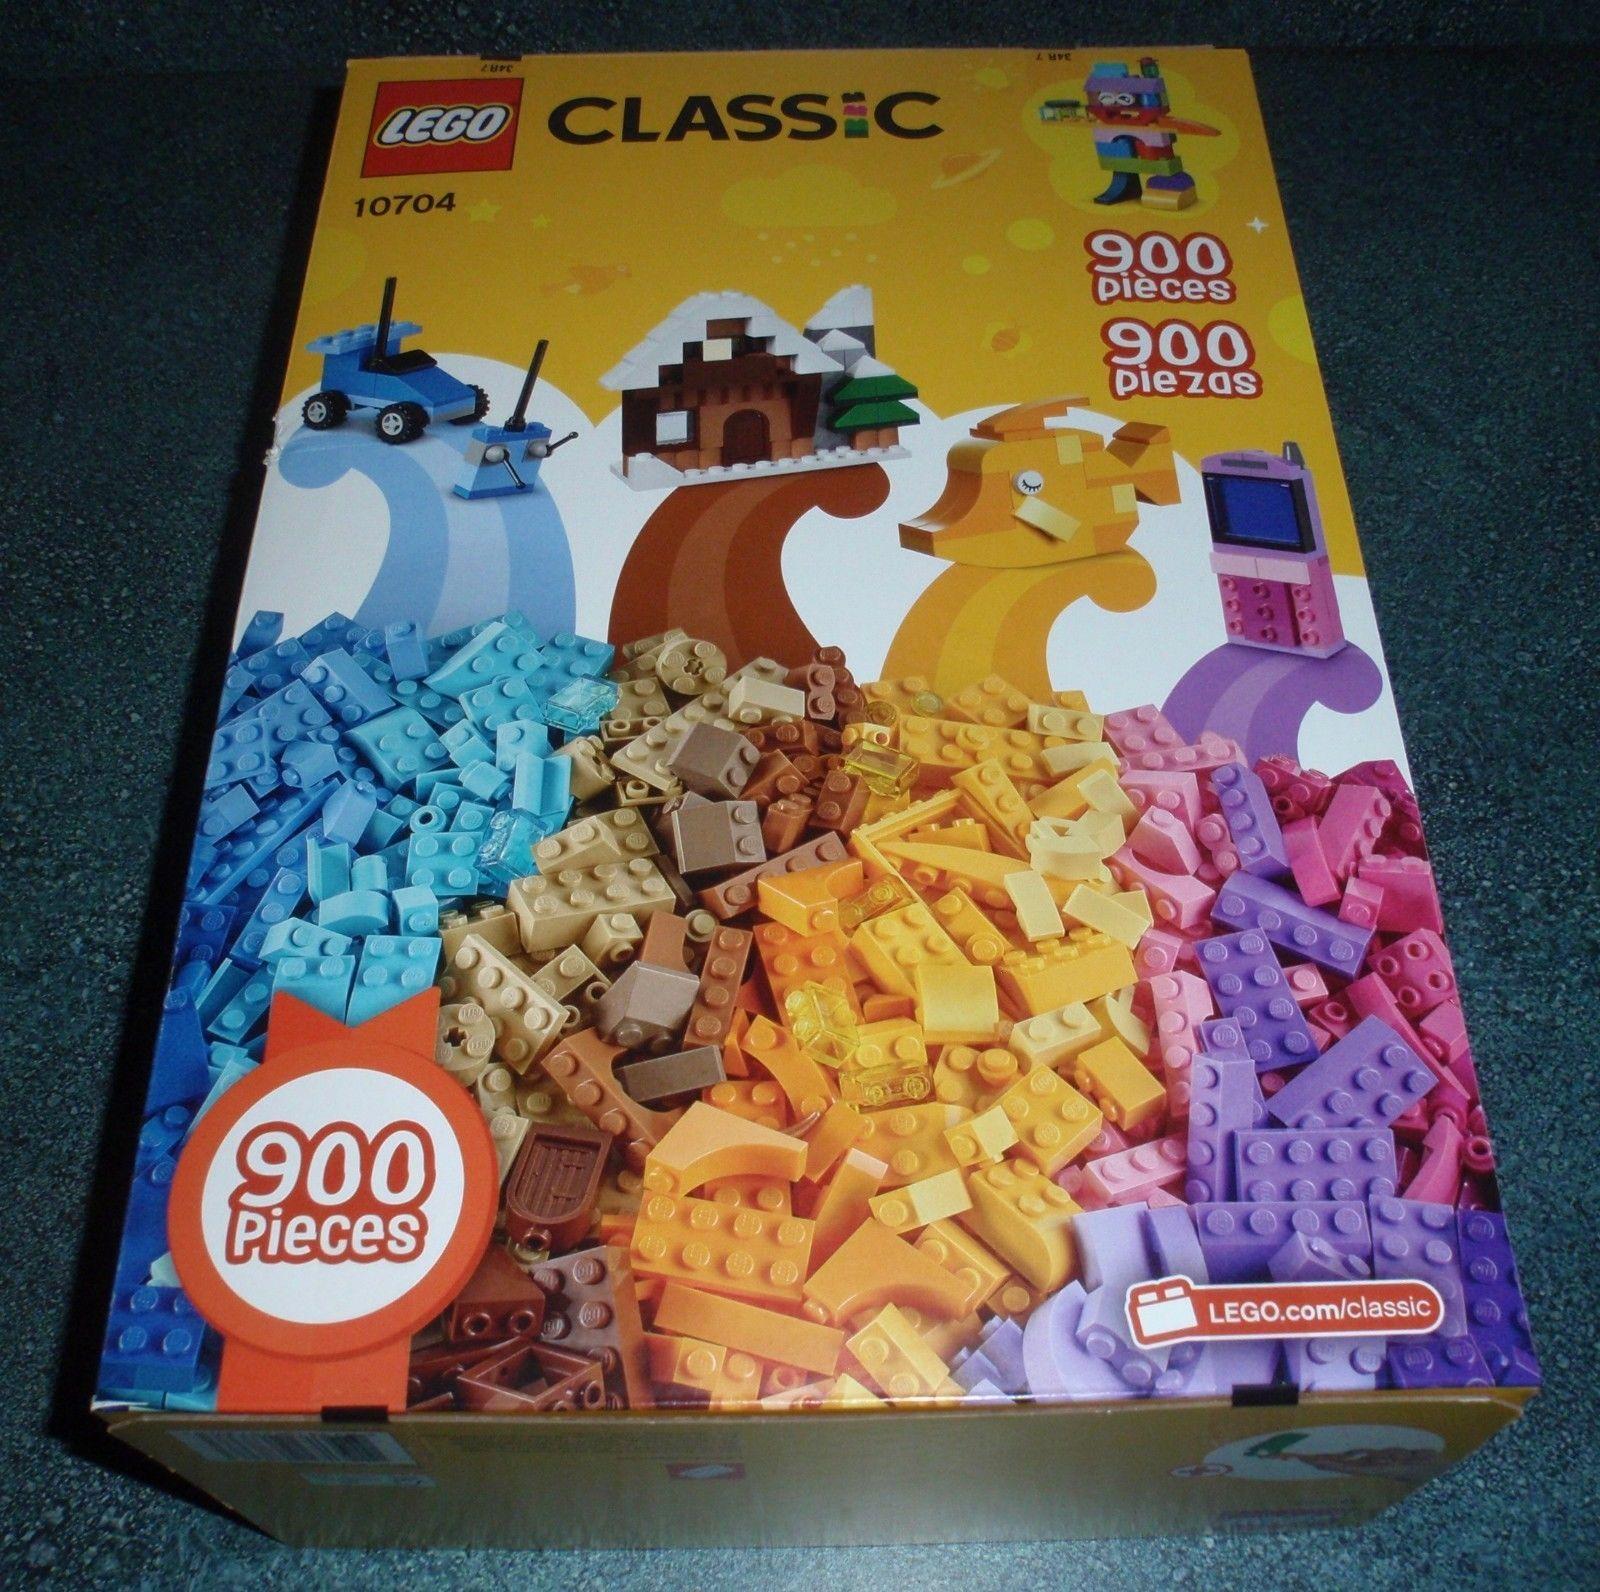 Lego Classic Creative 10704 Box 900 Pieces BRAND NEW SEALED BOX 4-99 In Bulk